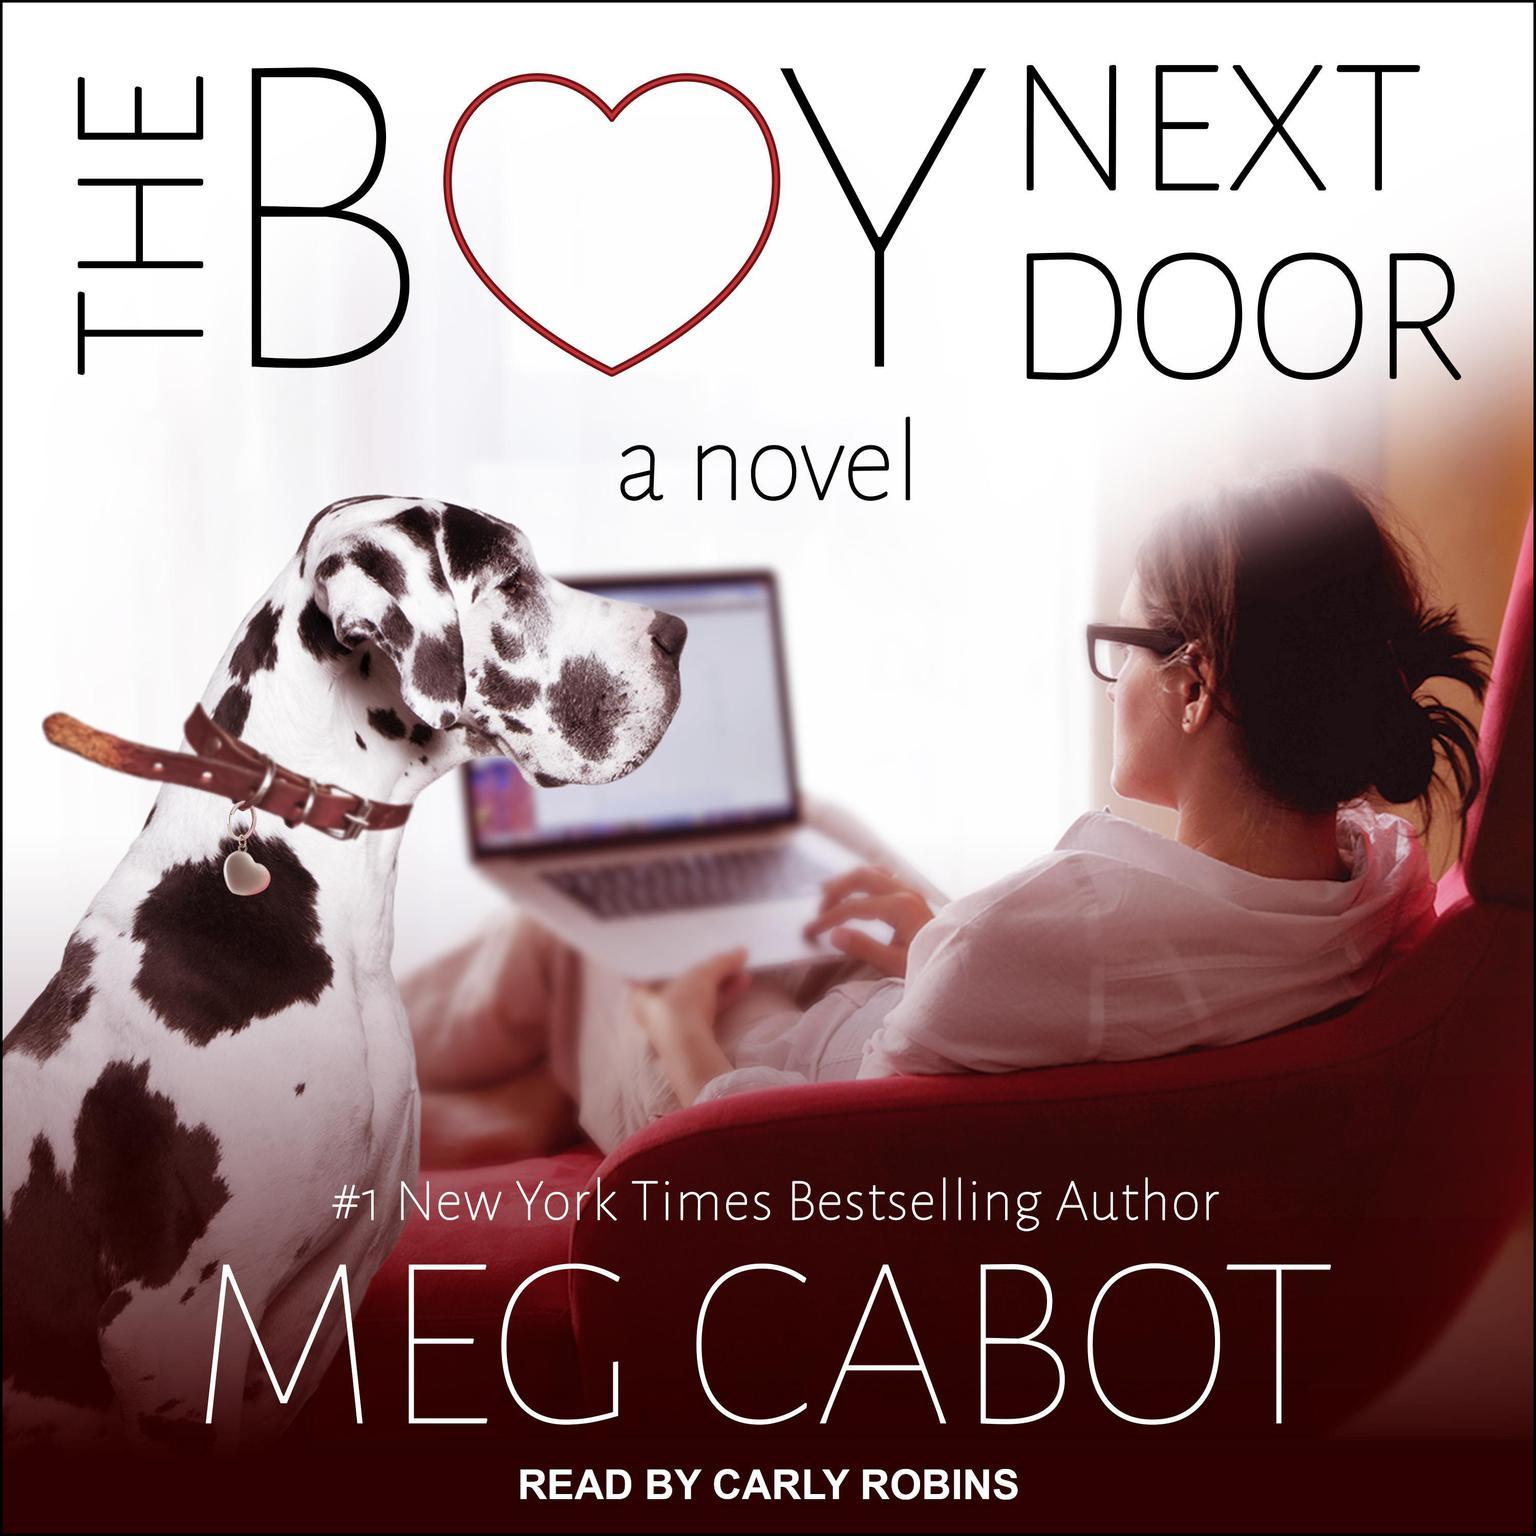 The Boy Next Door: A Novel Audiobook, by Meg Cabot